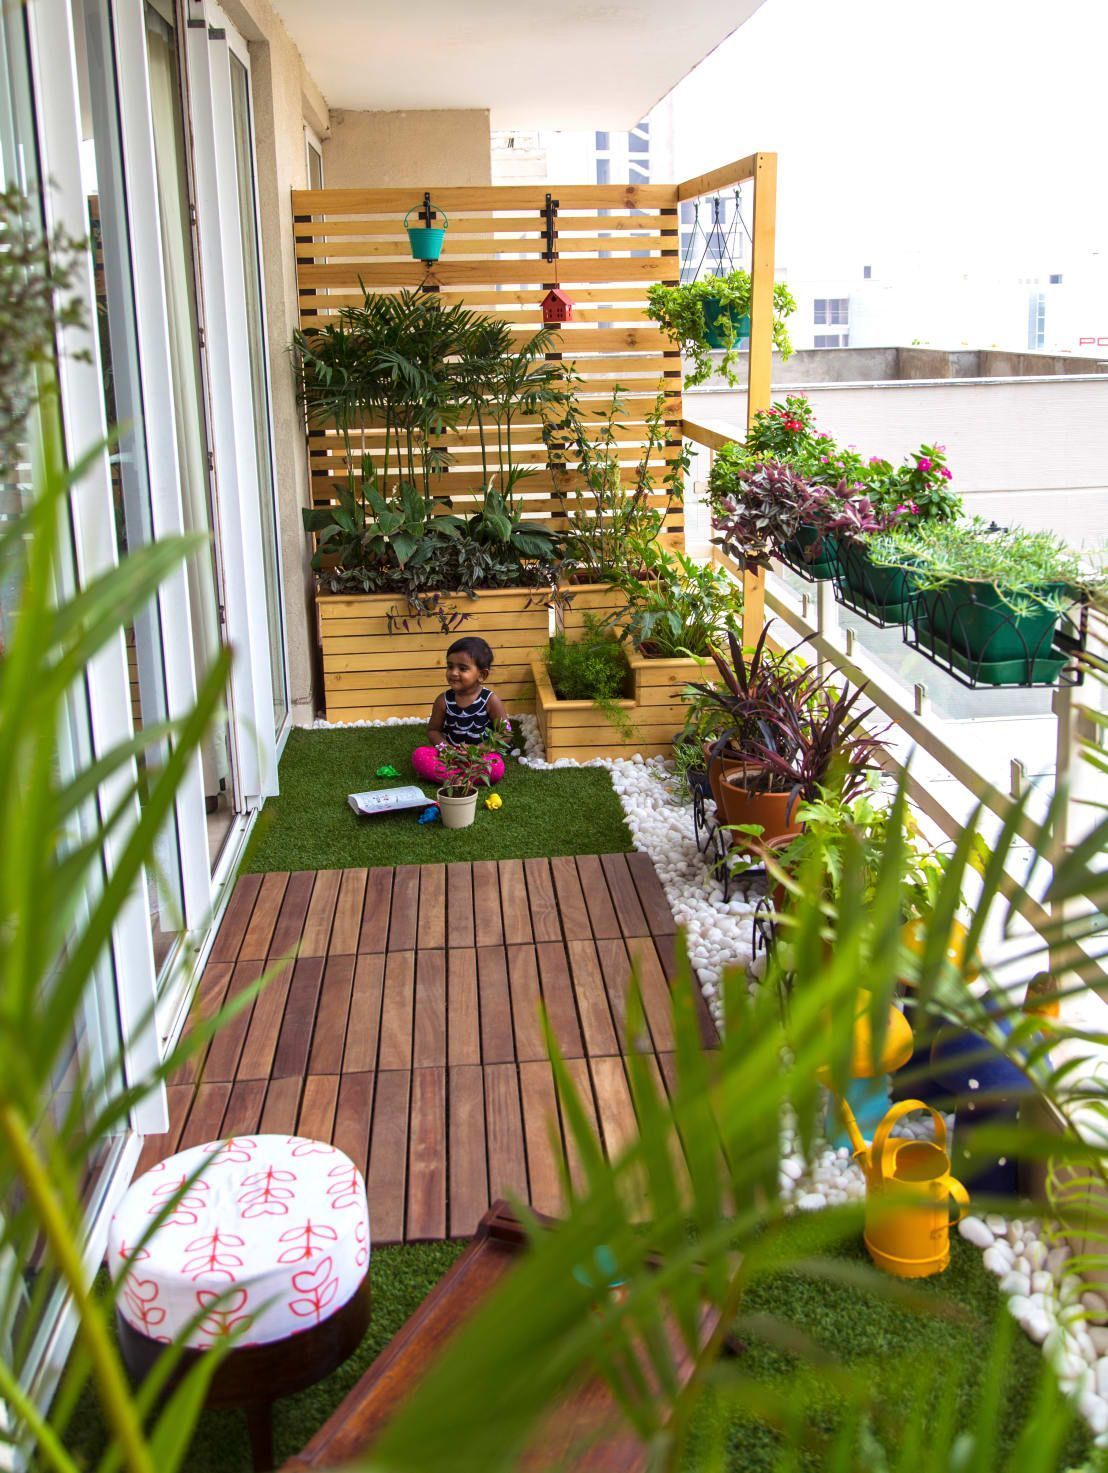 Photo of Prodigious Patio Decorating Ideas Small Balcony Garden, Whether you are searchin…